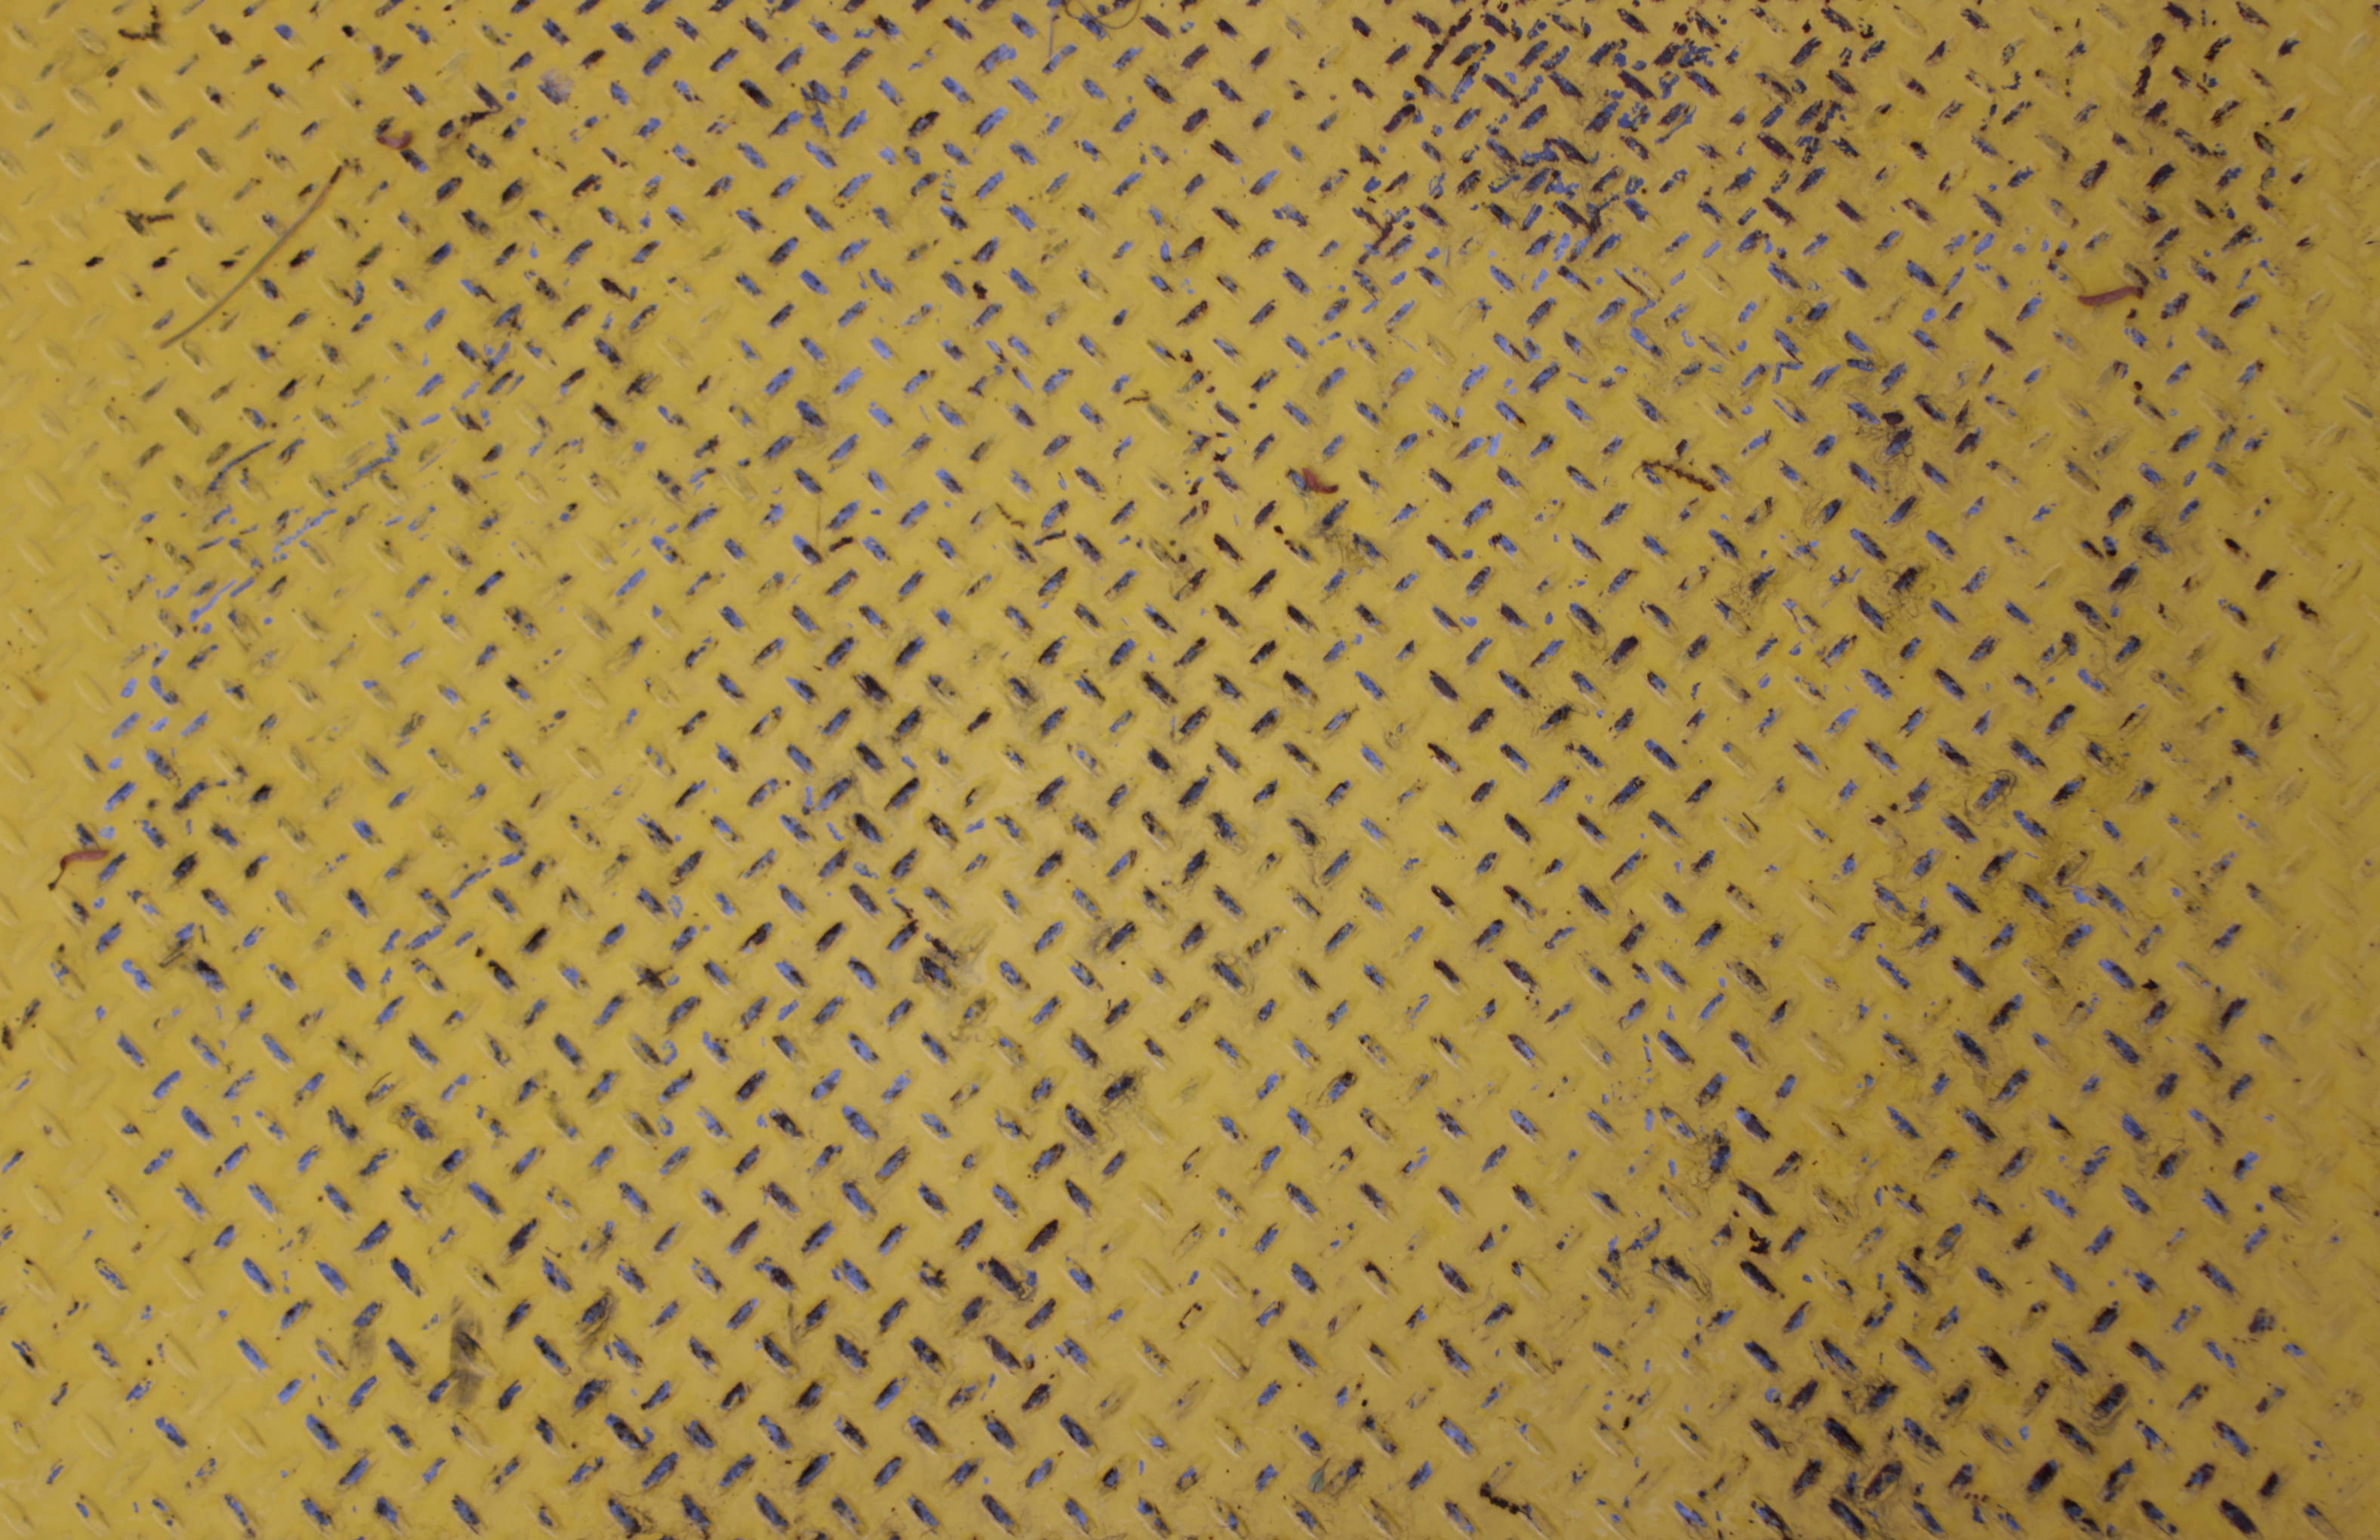 Grunge Diamond Plate Texture